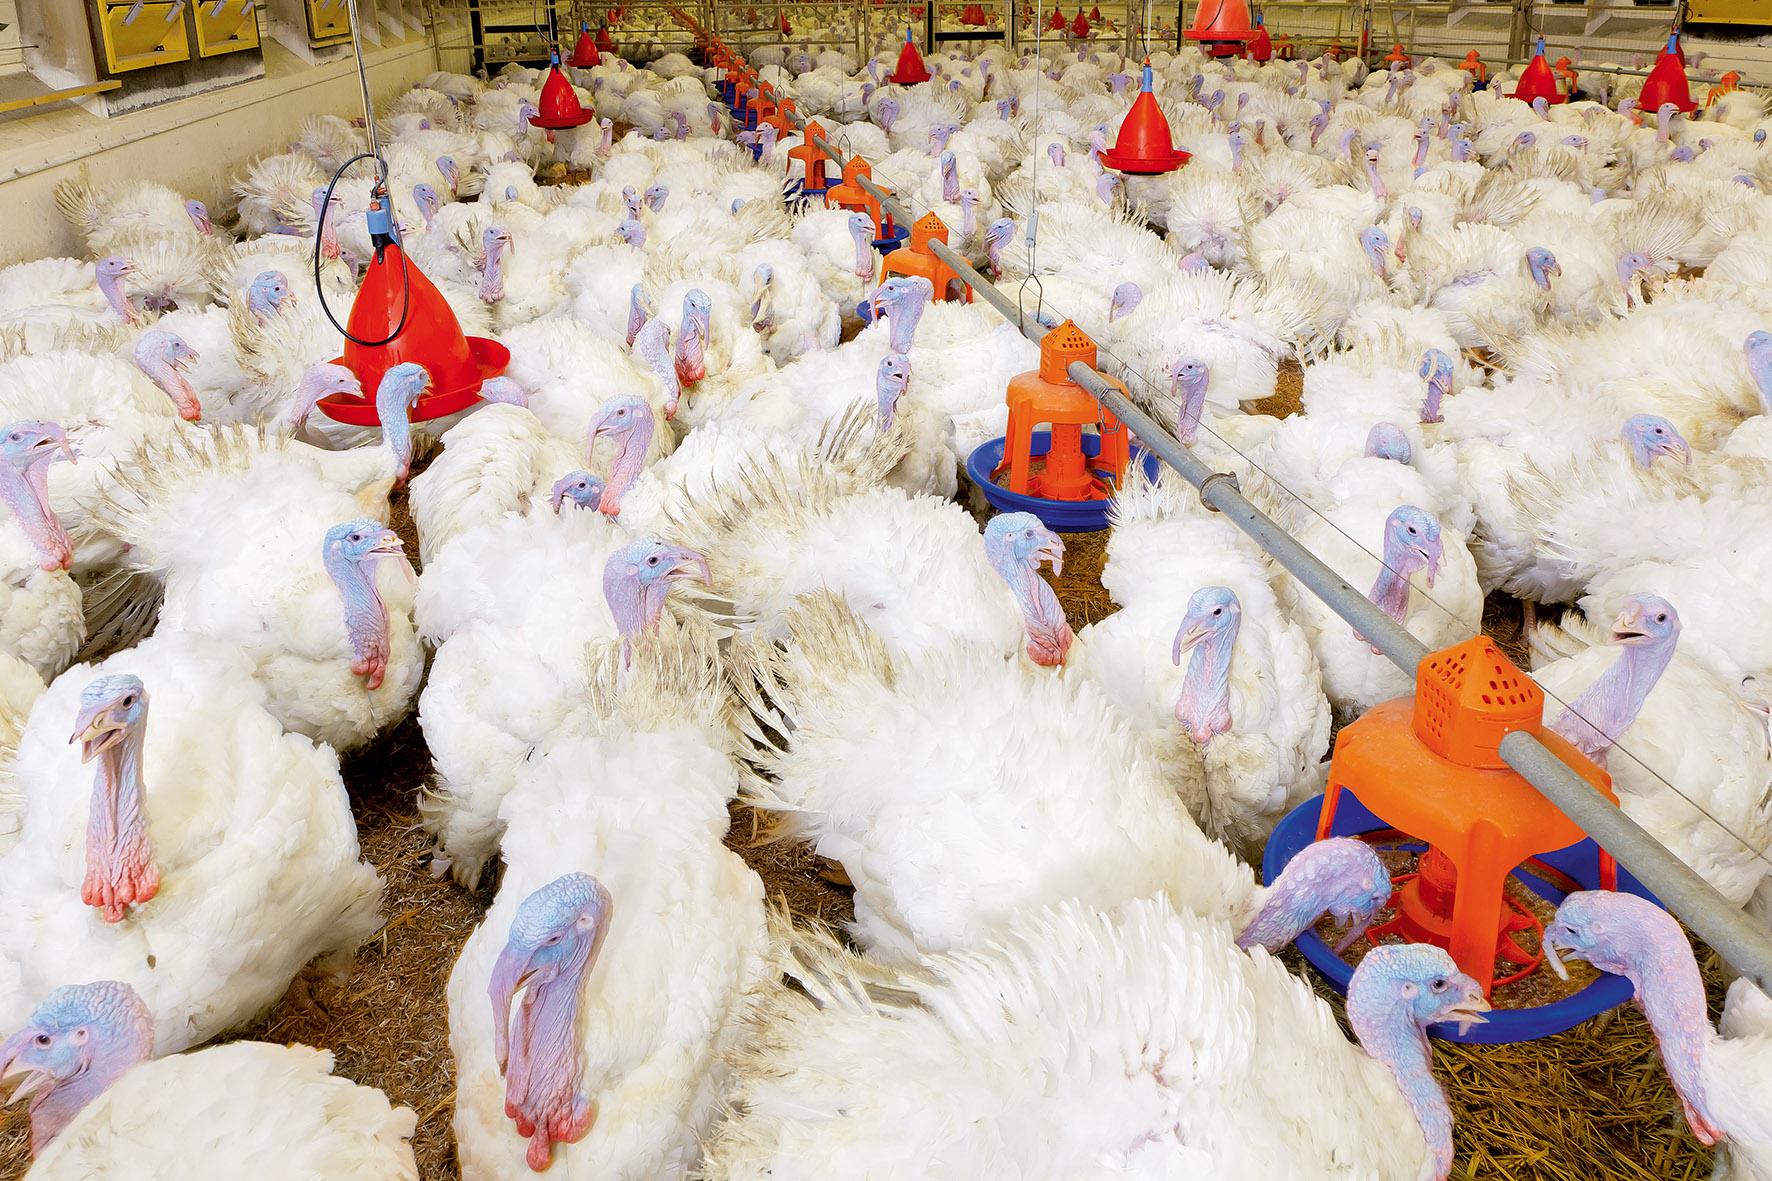 Peternakan Ayam Kalkun Pertumbuhan Unggas Big Dutchman